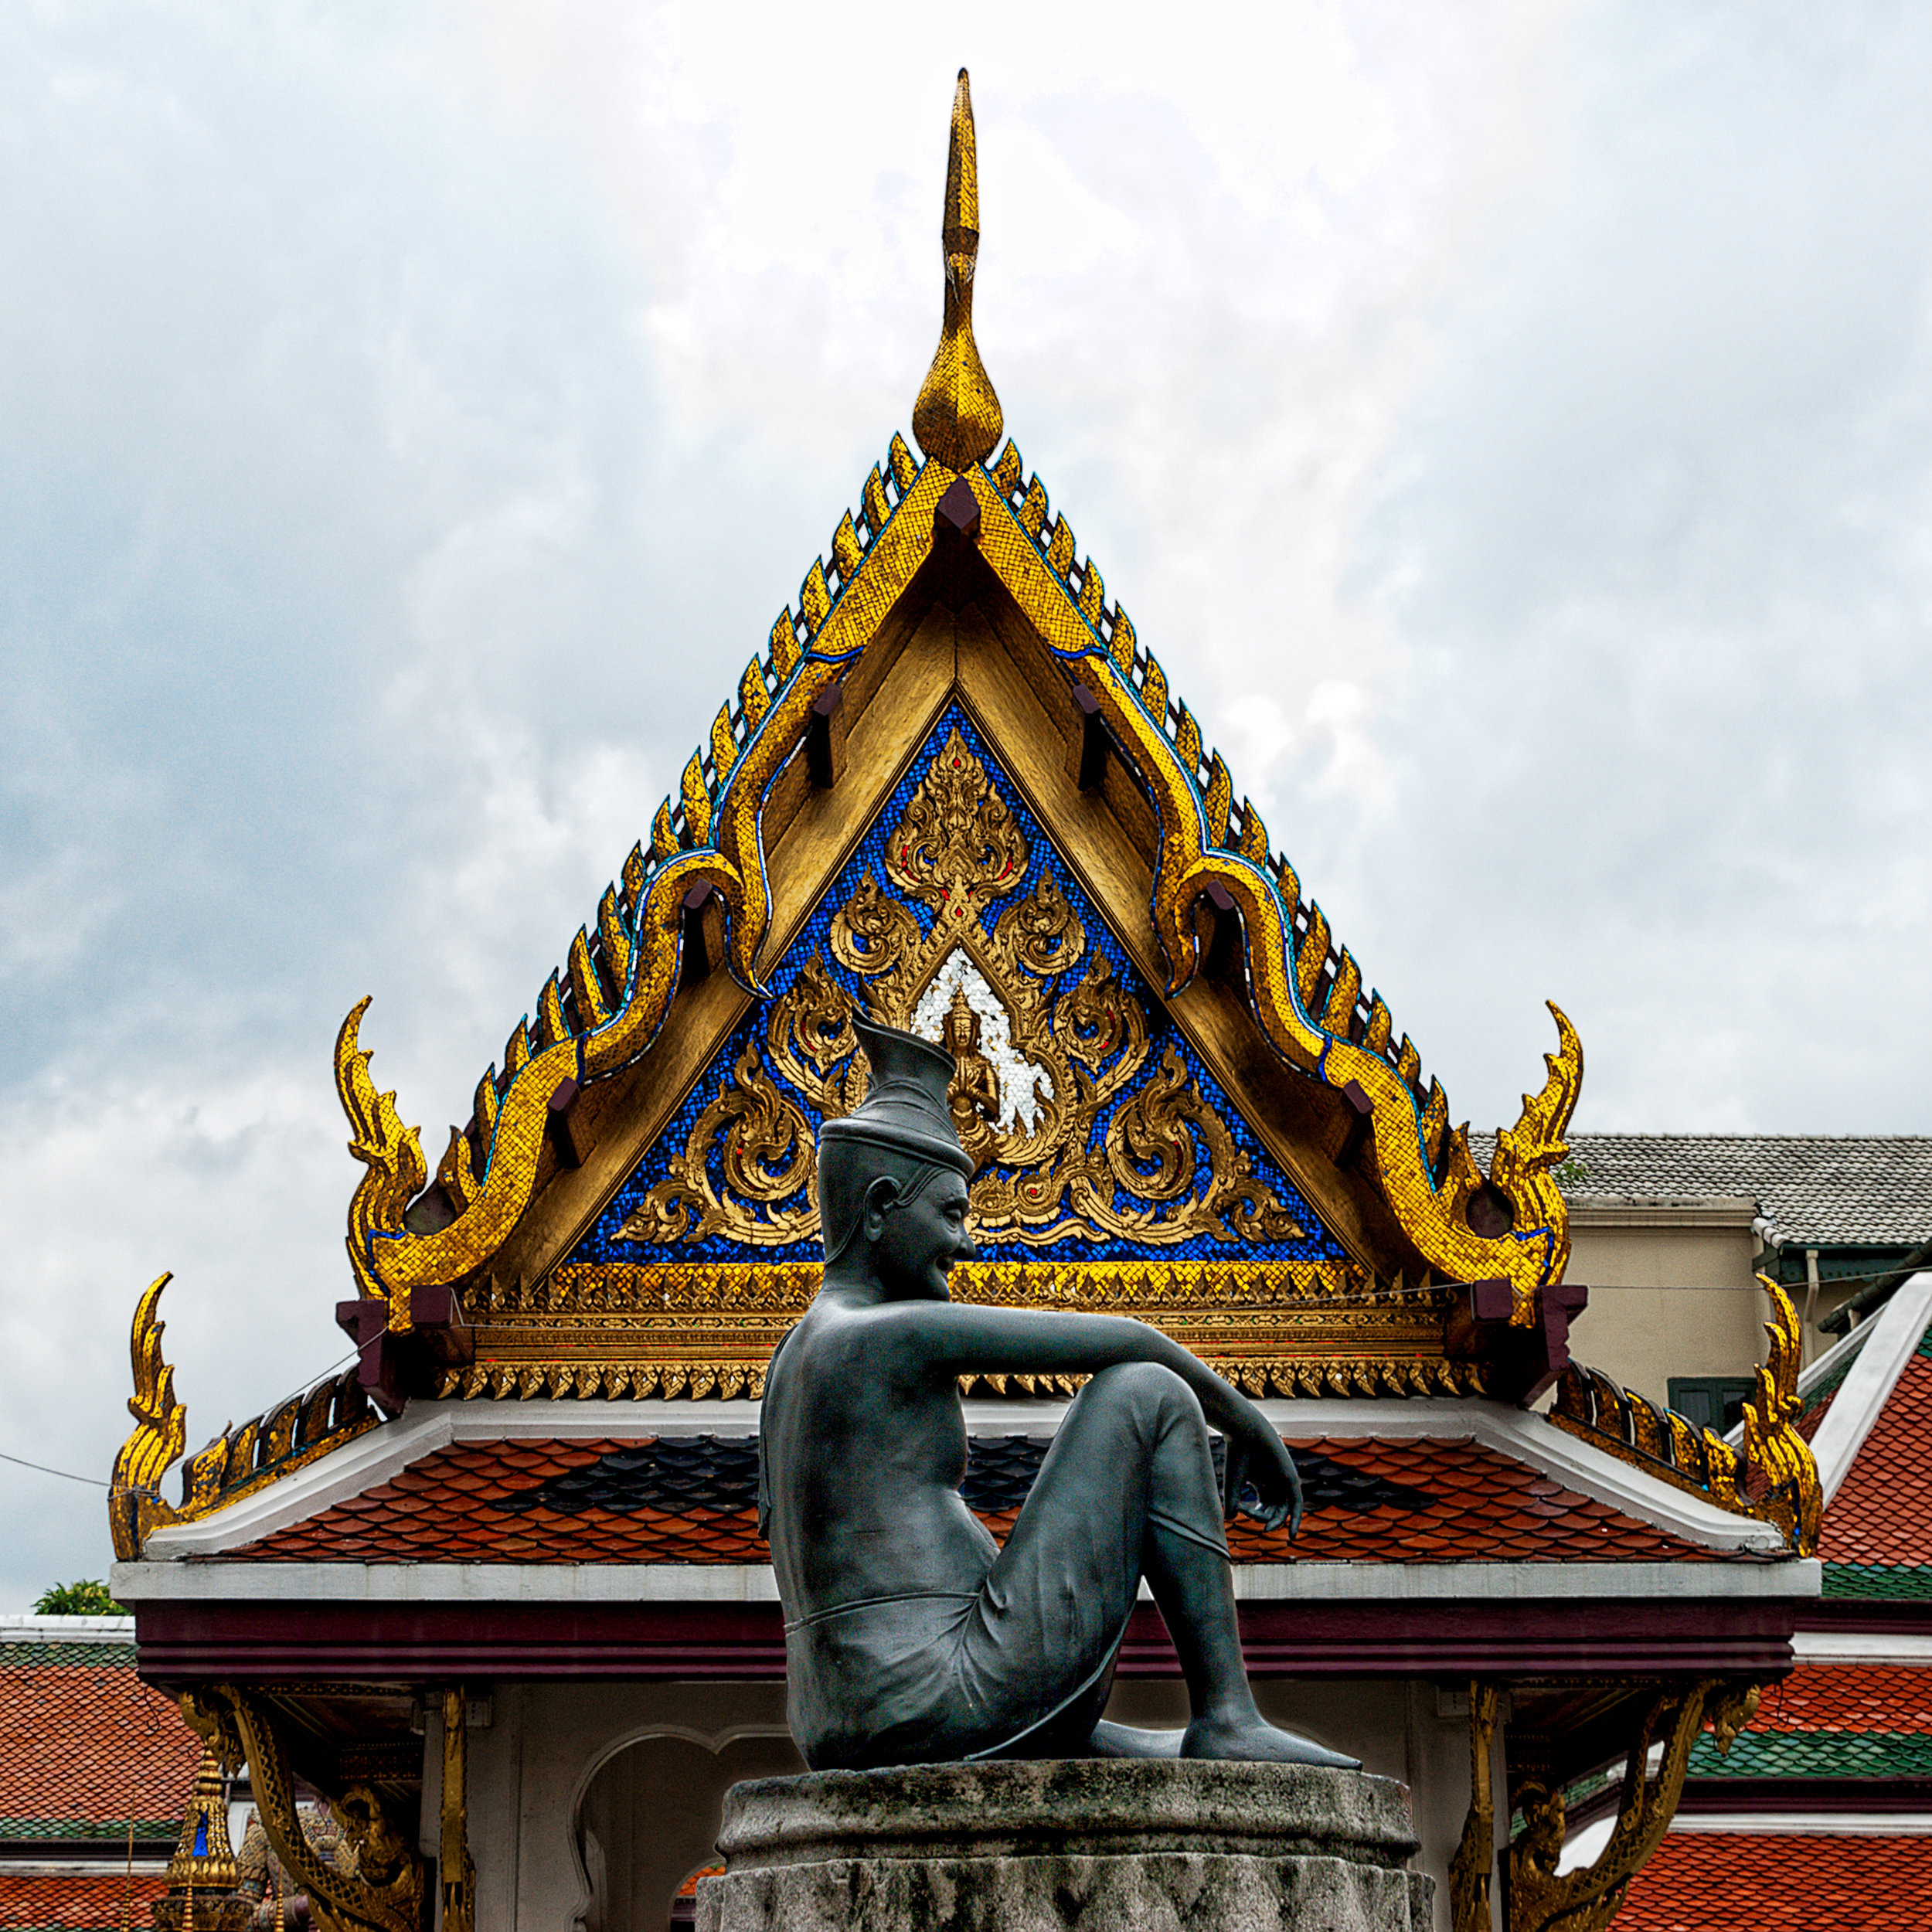 Thailand-John Bardell__DSC3590a.jpg